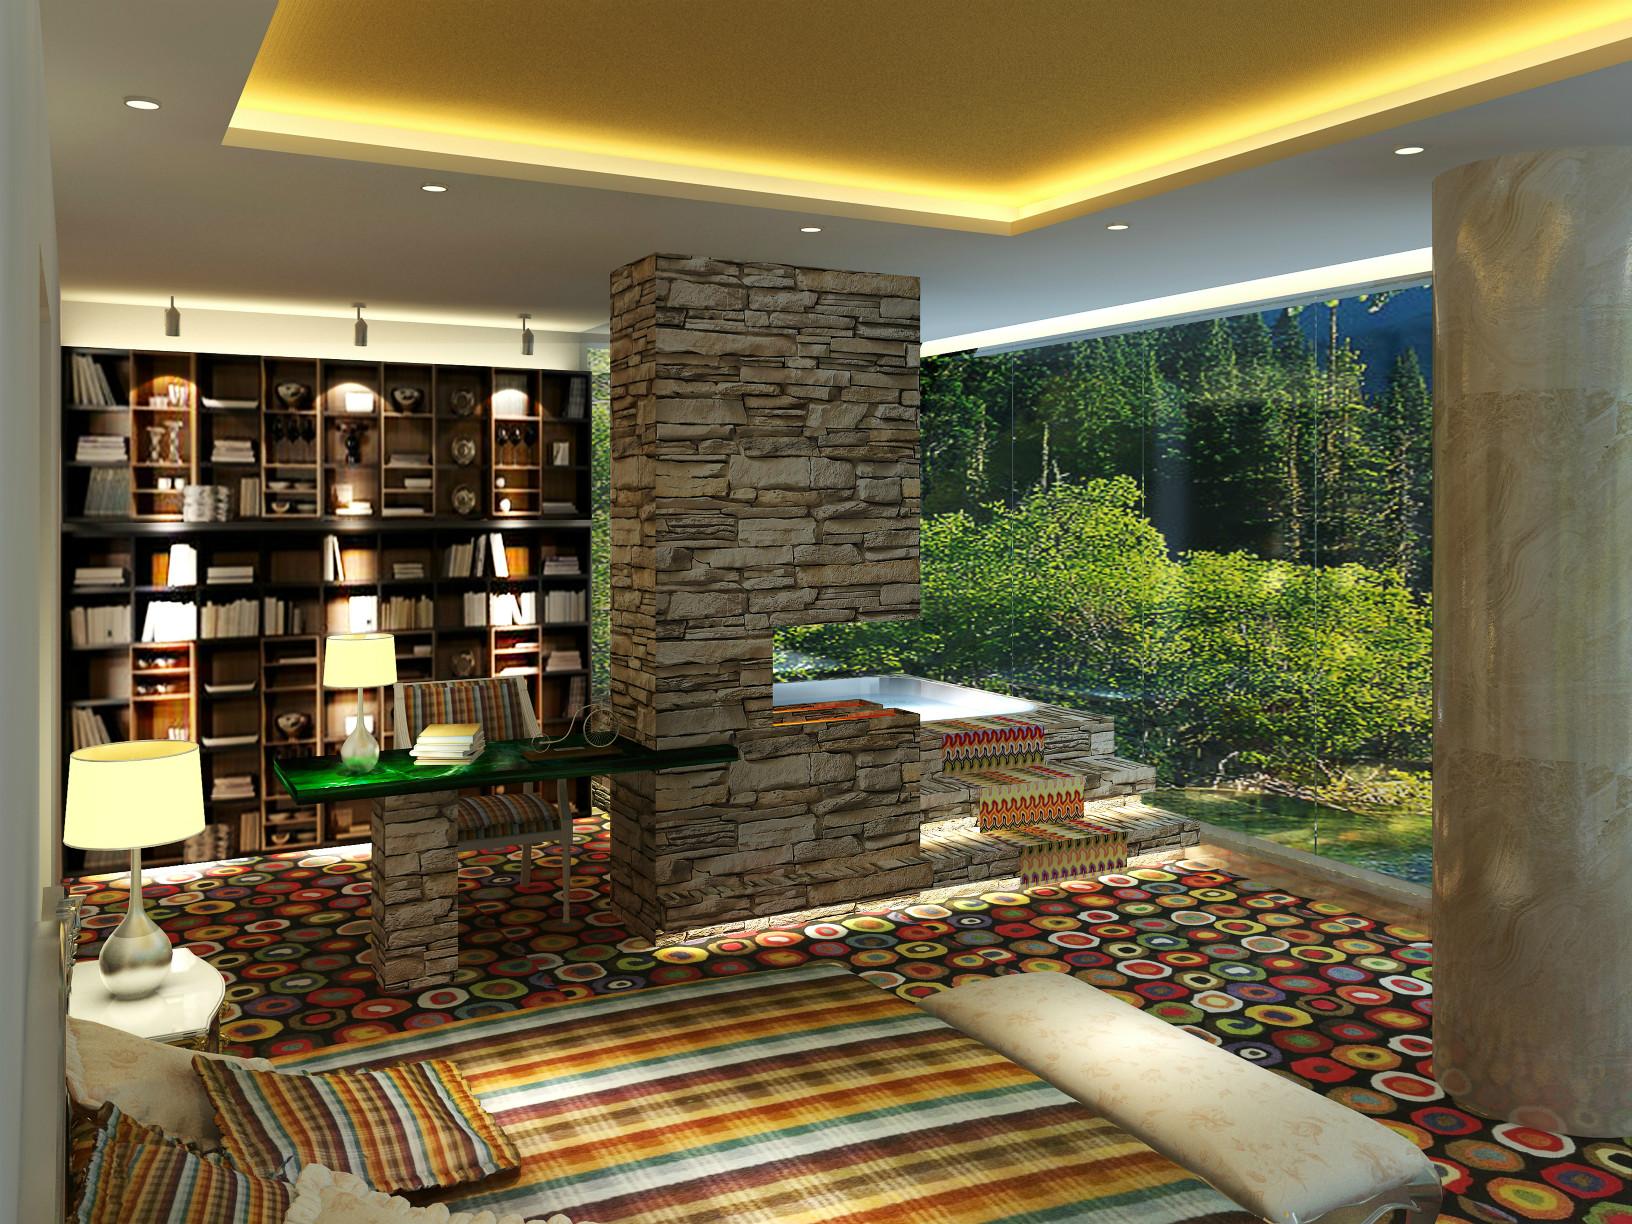 Eco interior design sgt for Villa interior designers ltd nairobi kenya